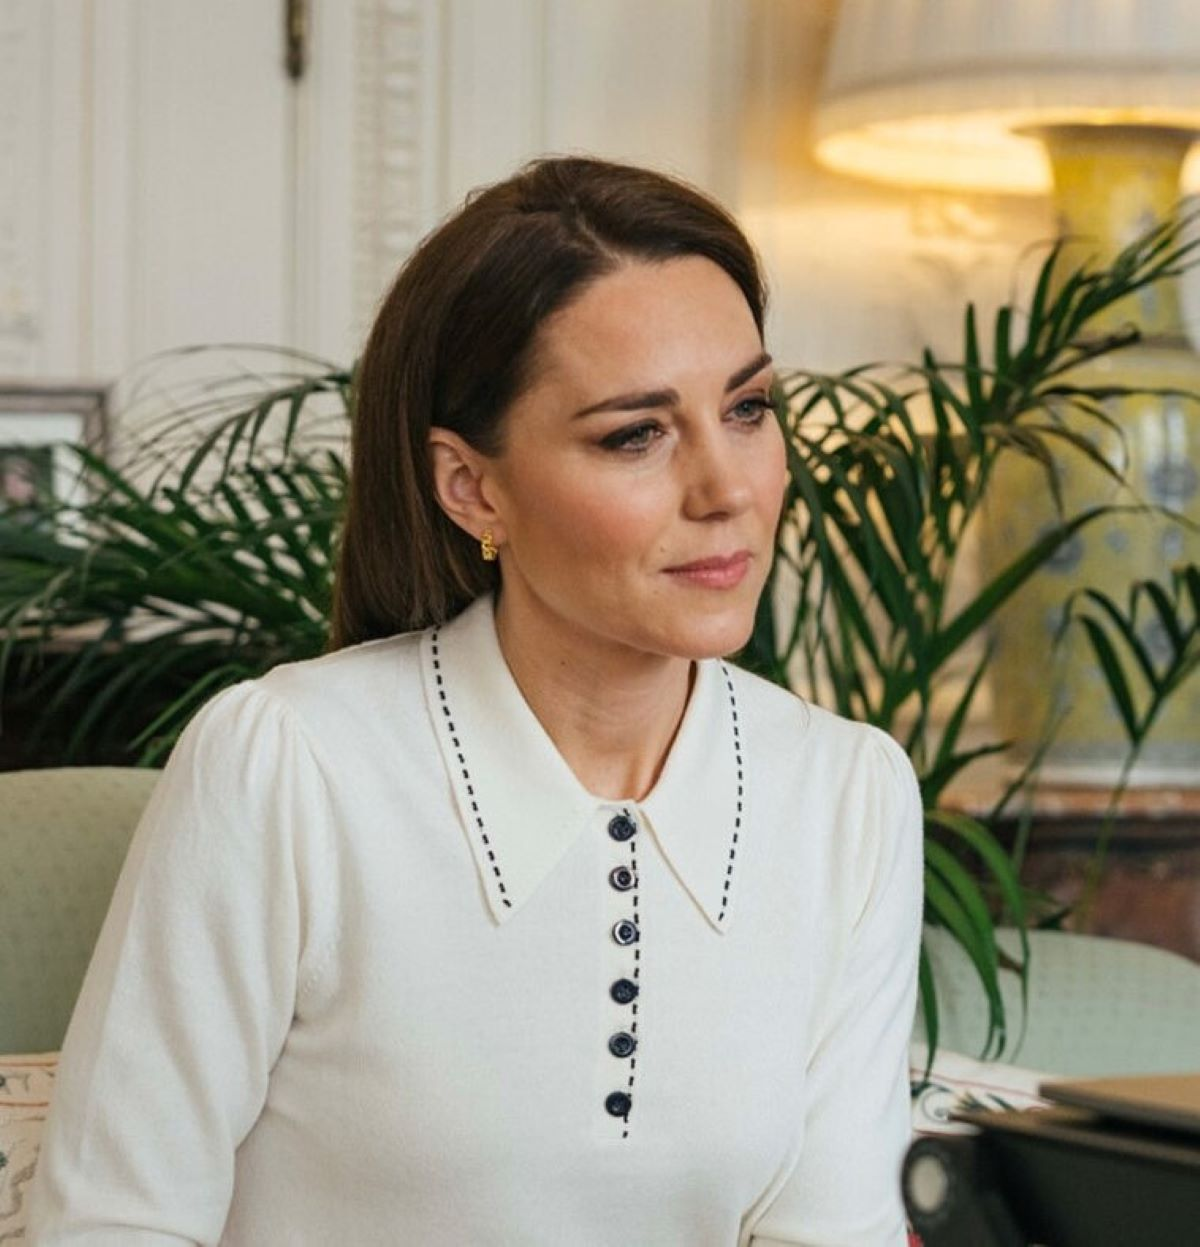 Kate Middleton Dolore Morte Sabina Nessa Inghilterra